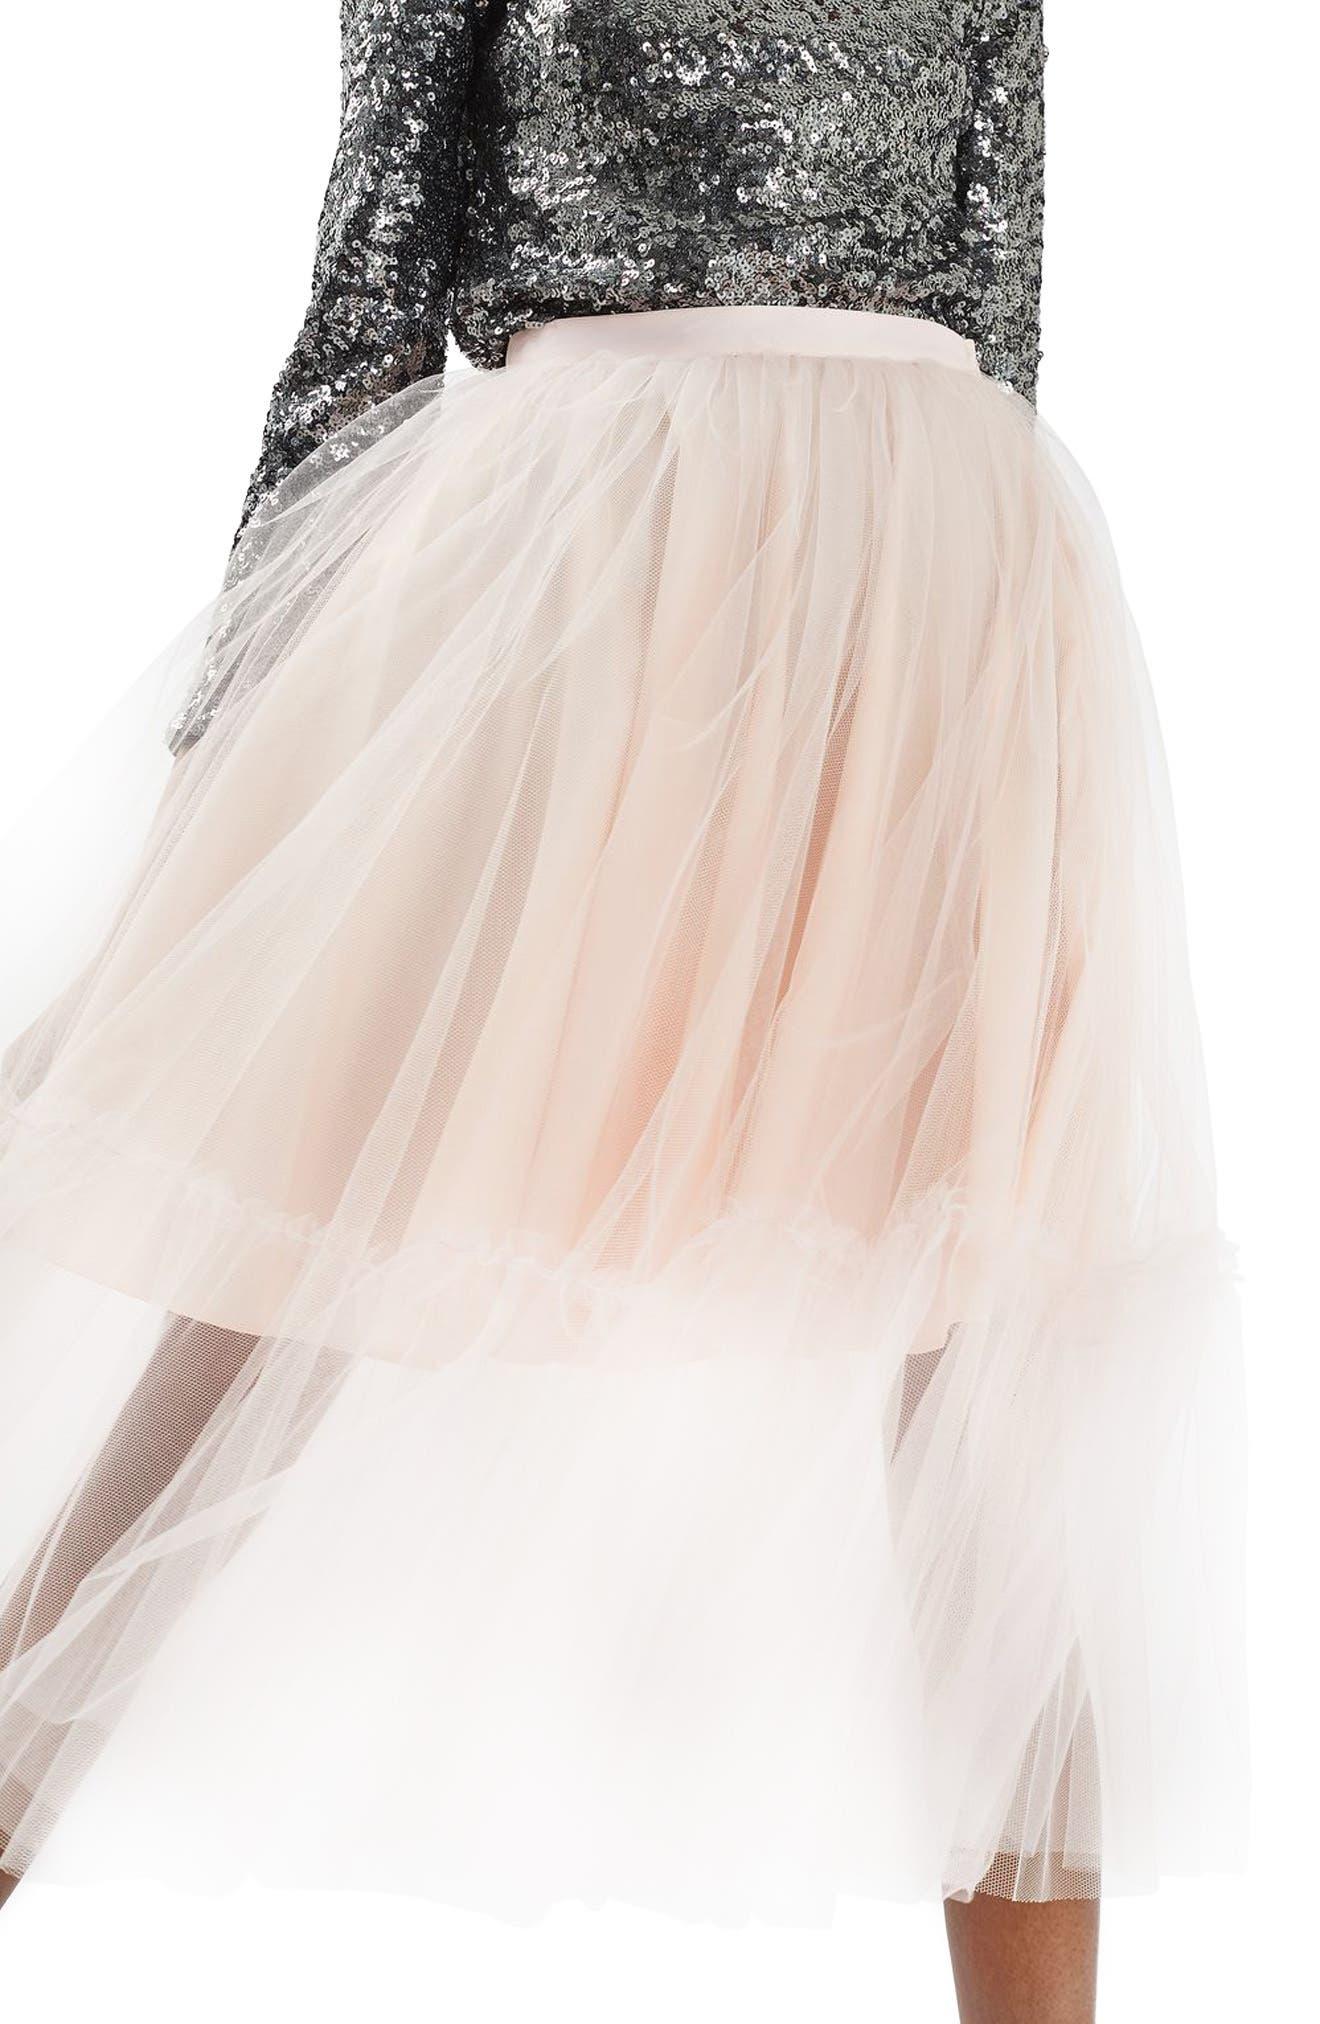 Alternate Image 1 Selected - Topshop Tutu Tulle Skirt